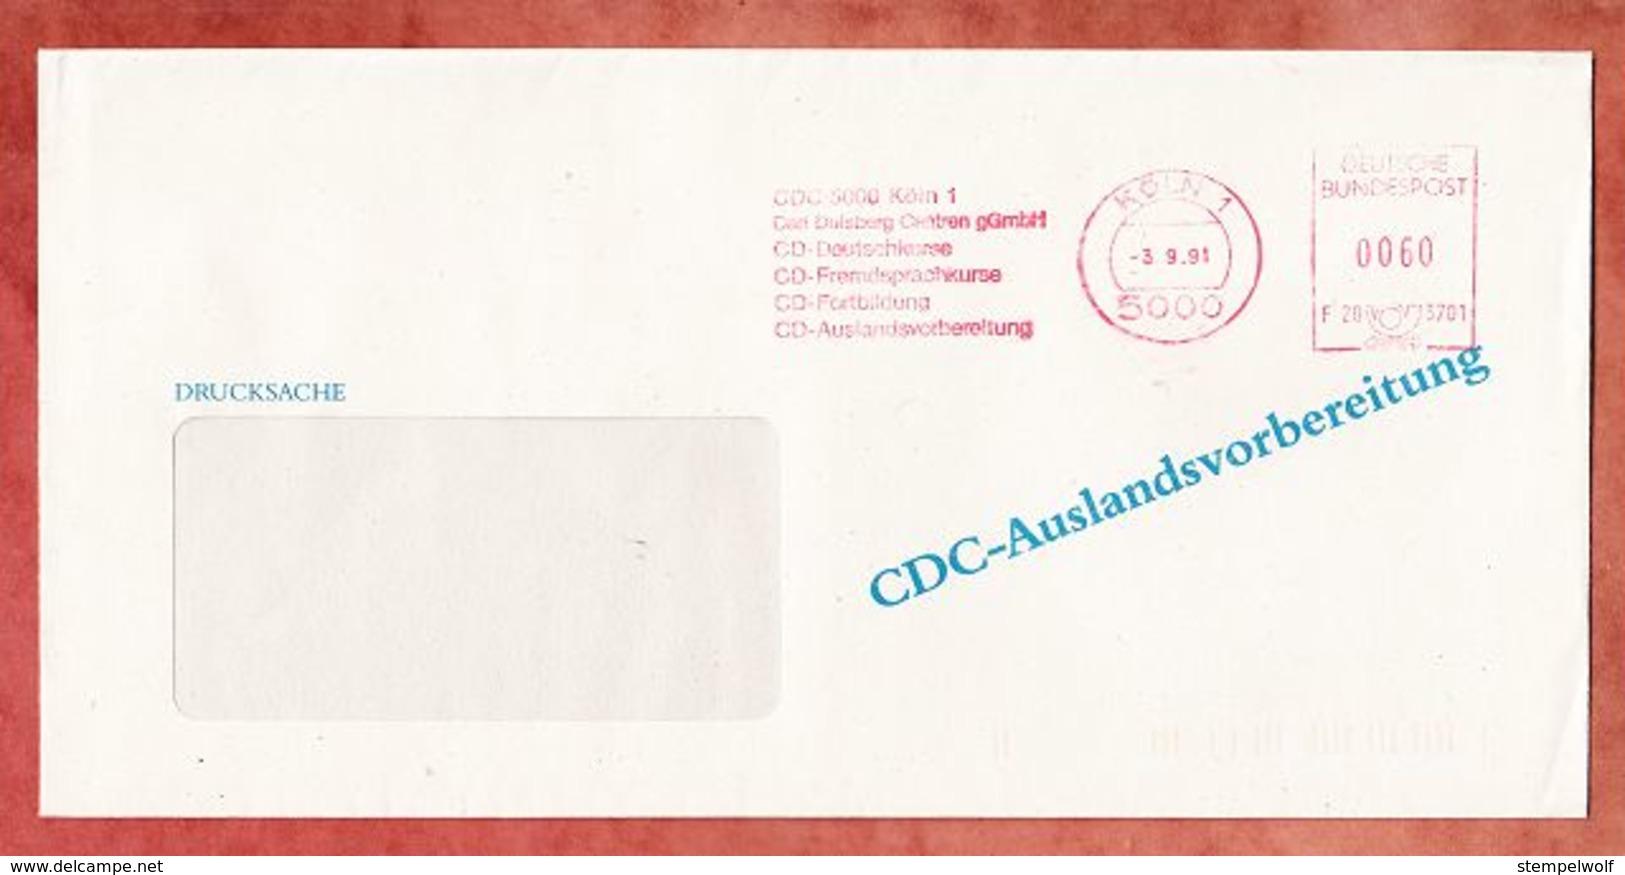 Drucksache, Francotyp-Postalia F20-3701, CDC Carl Duisberg Centren, 60 Pfg, Koeln 1991 (92704) - Machine Stamps (ATM)